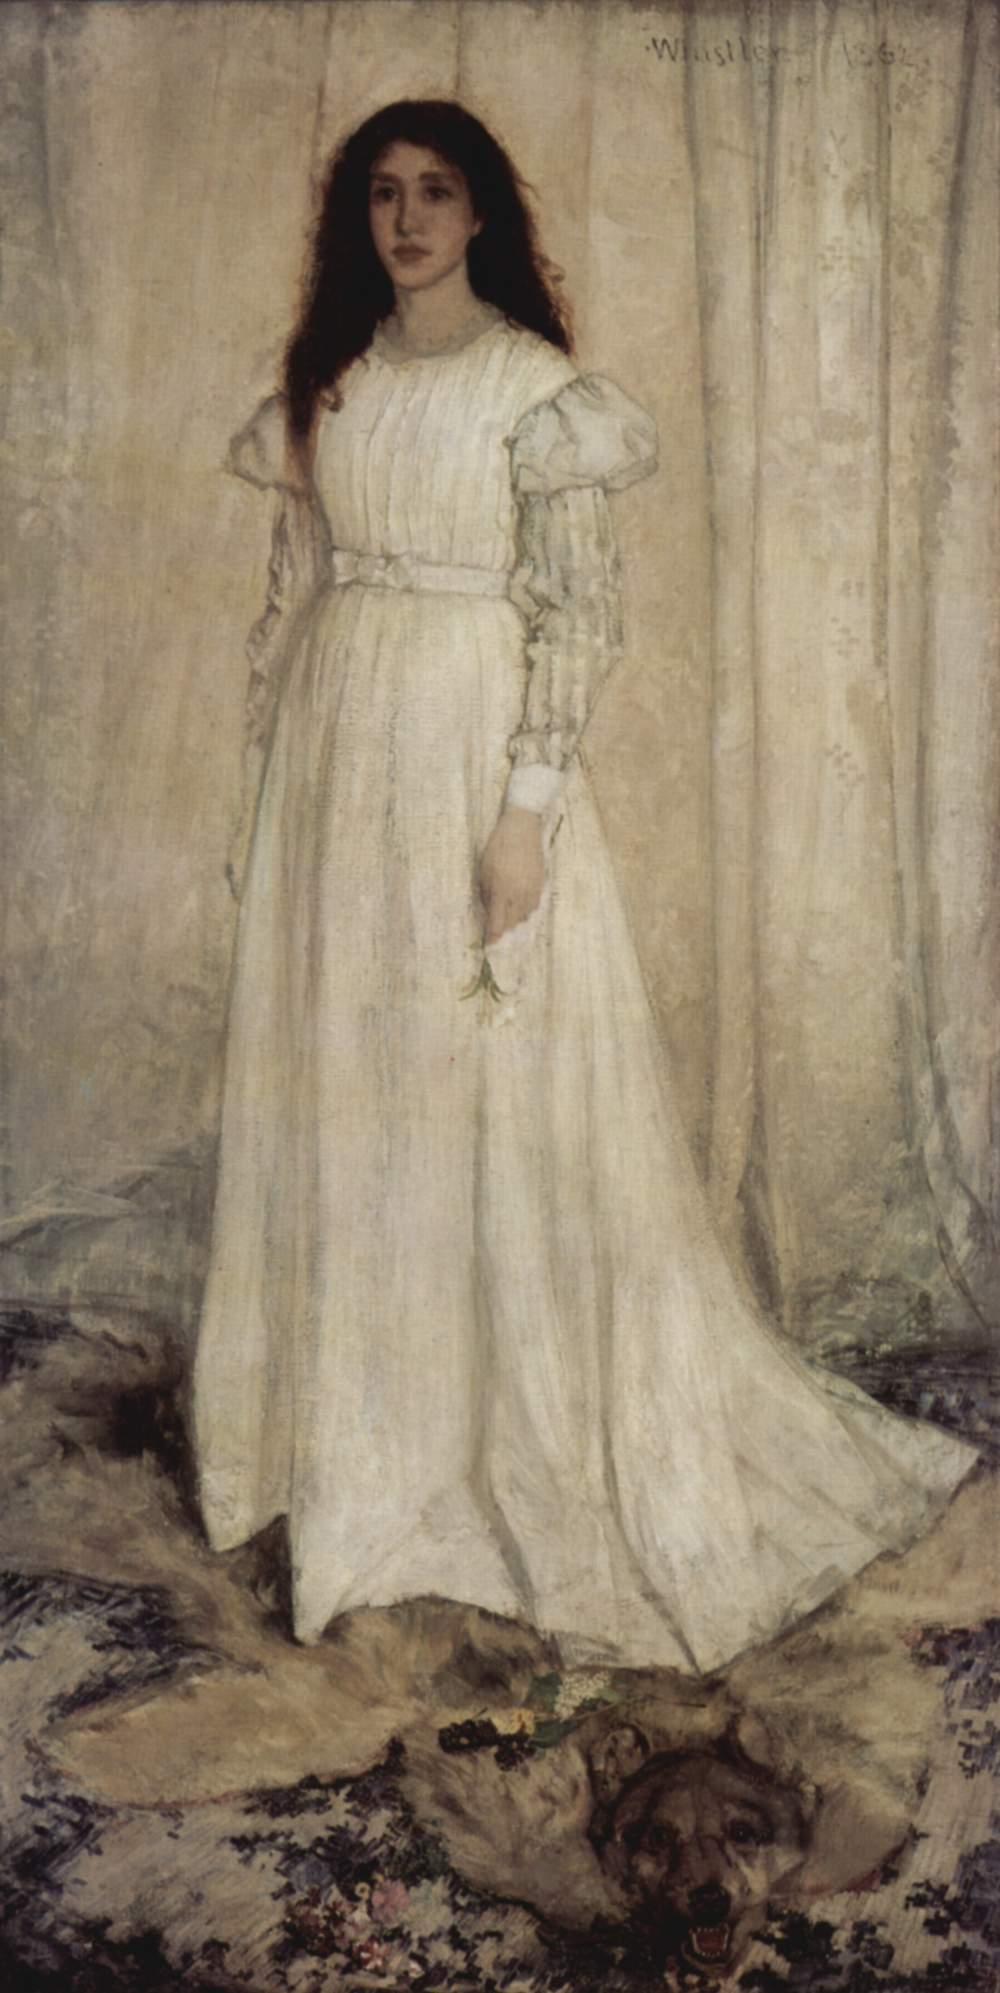 Joanna Hiffernan